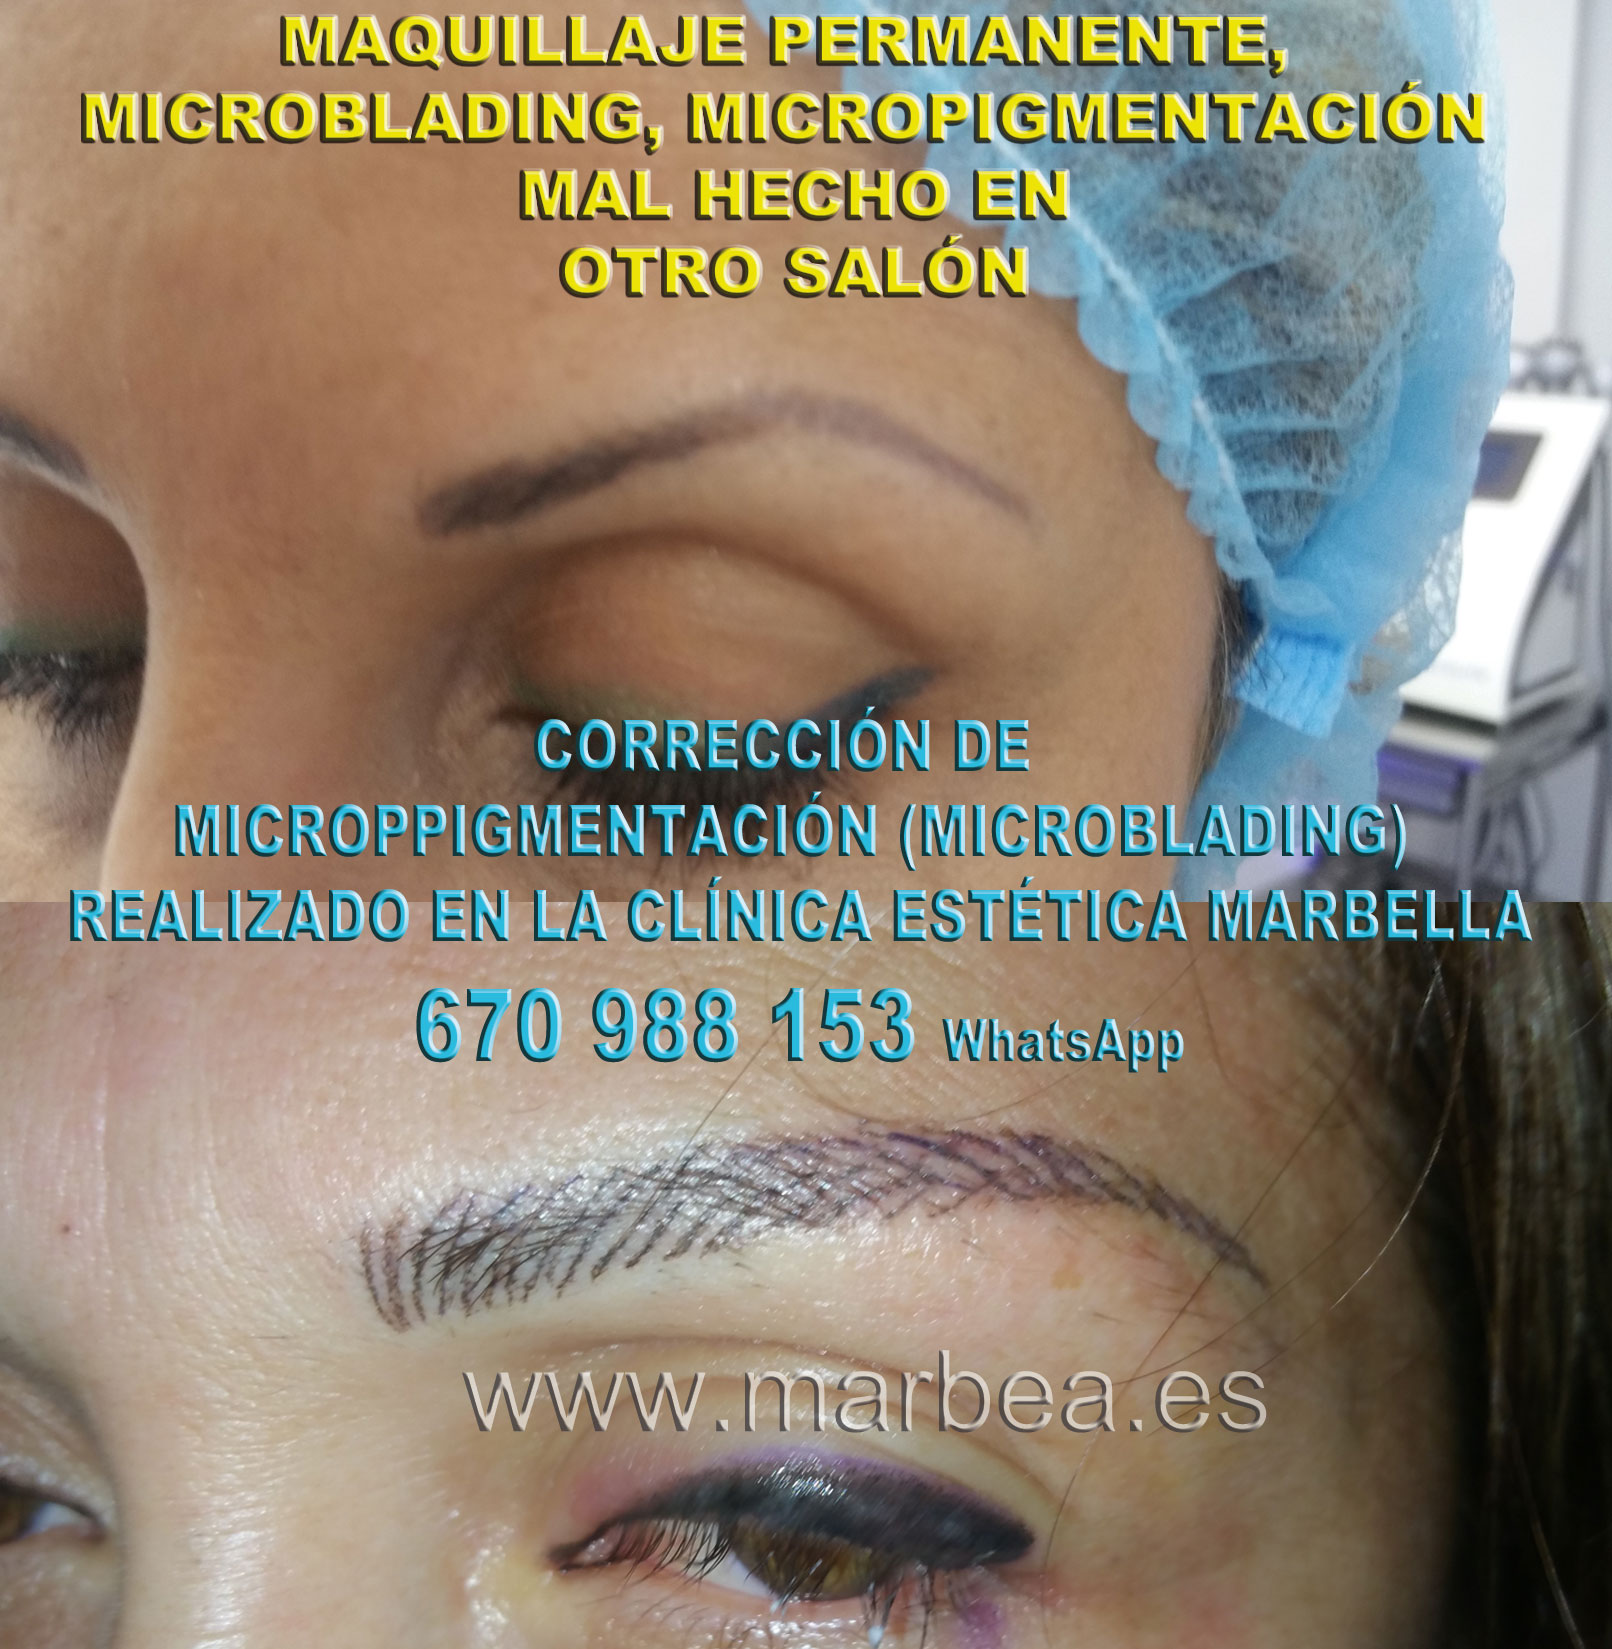 ELIMINAR TATUAJE CEJAS clínica estética micropigmentación propone micropigmentacion correctiva de cejas,corregir micropigmentación mal hecha